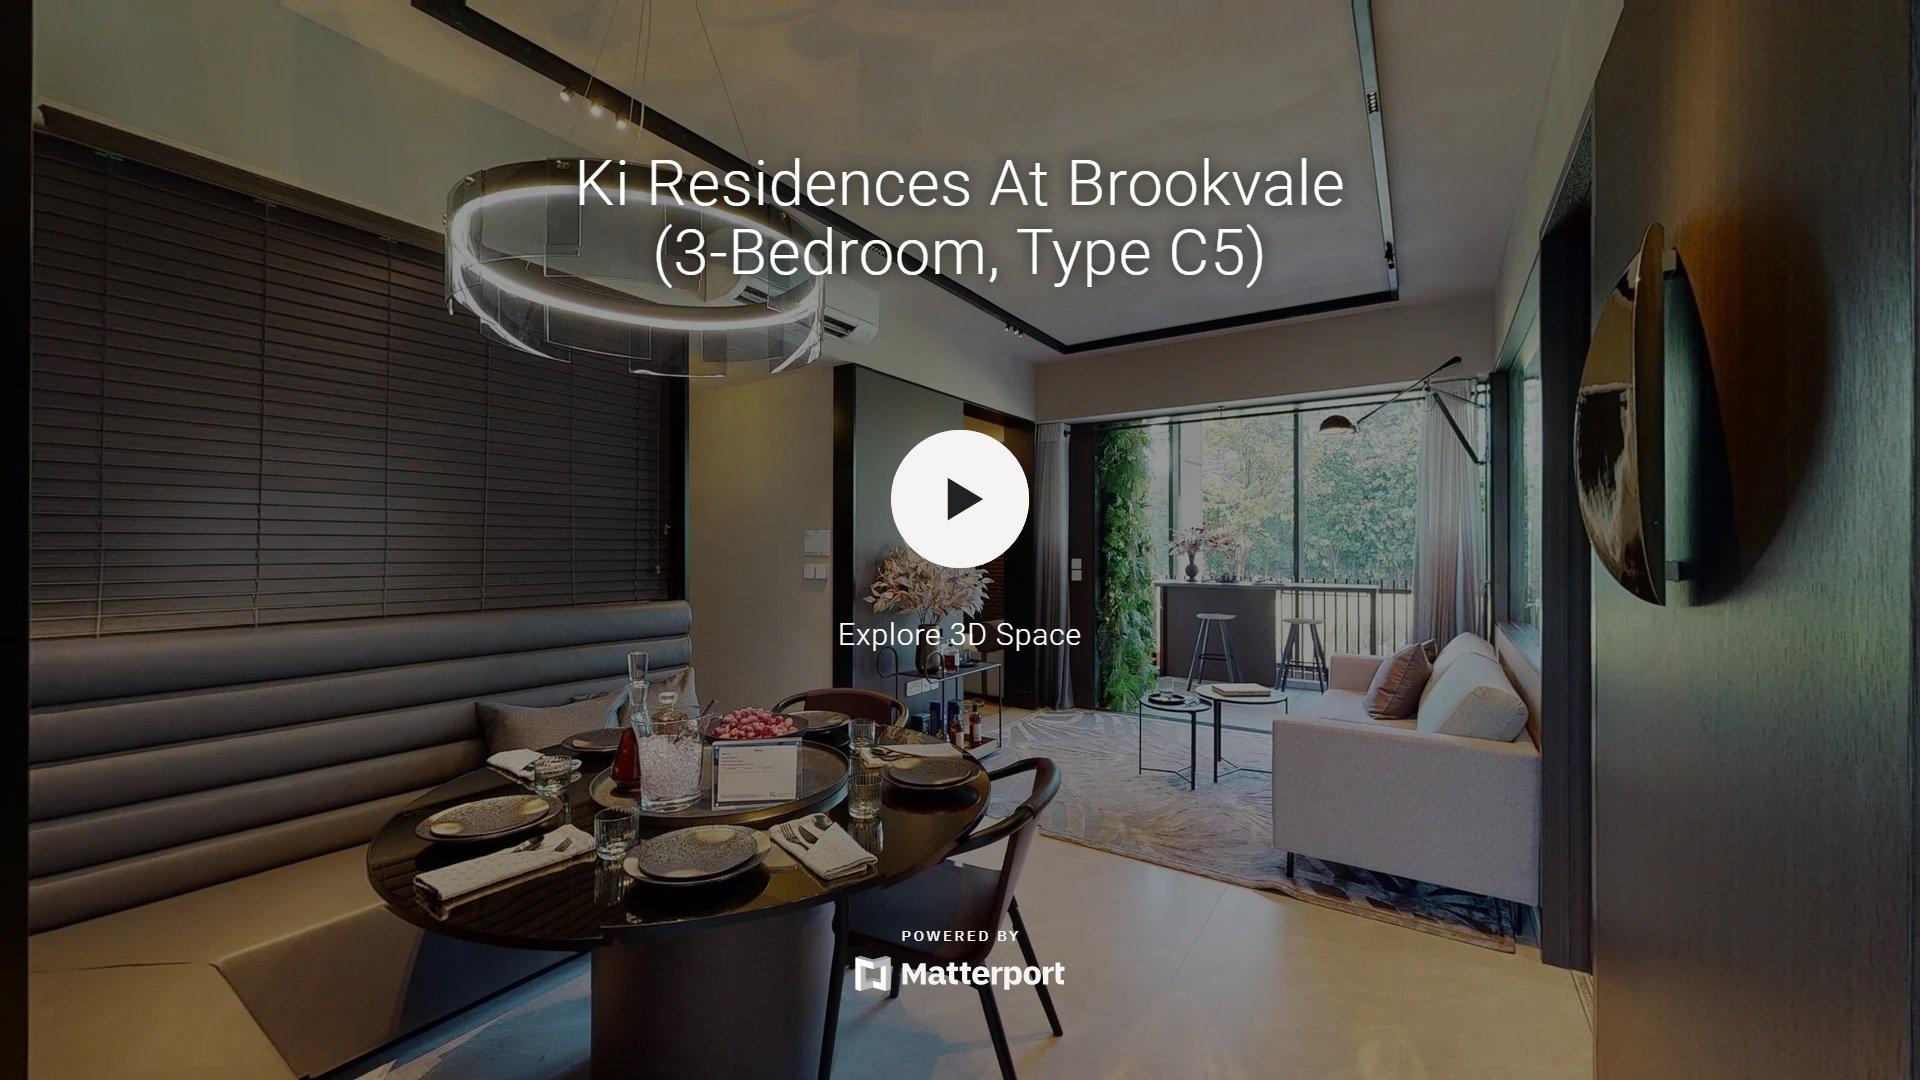 Ki Residences Virtual Tour 3 Bedroom Yard Utility Type C5